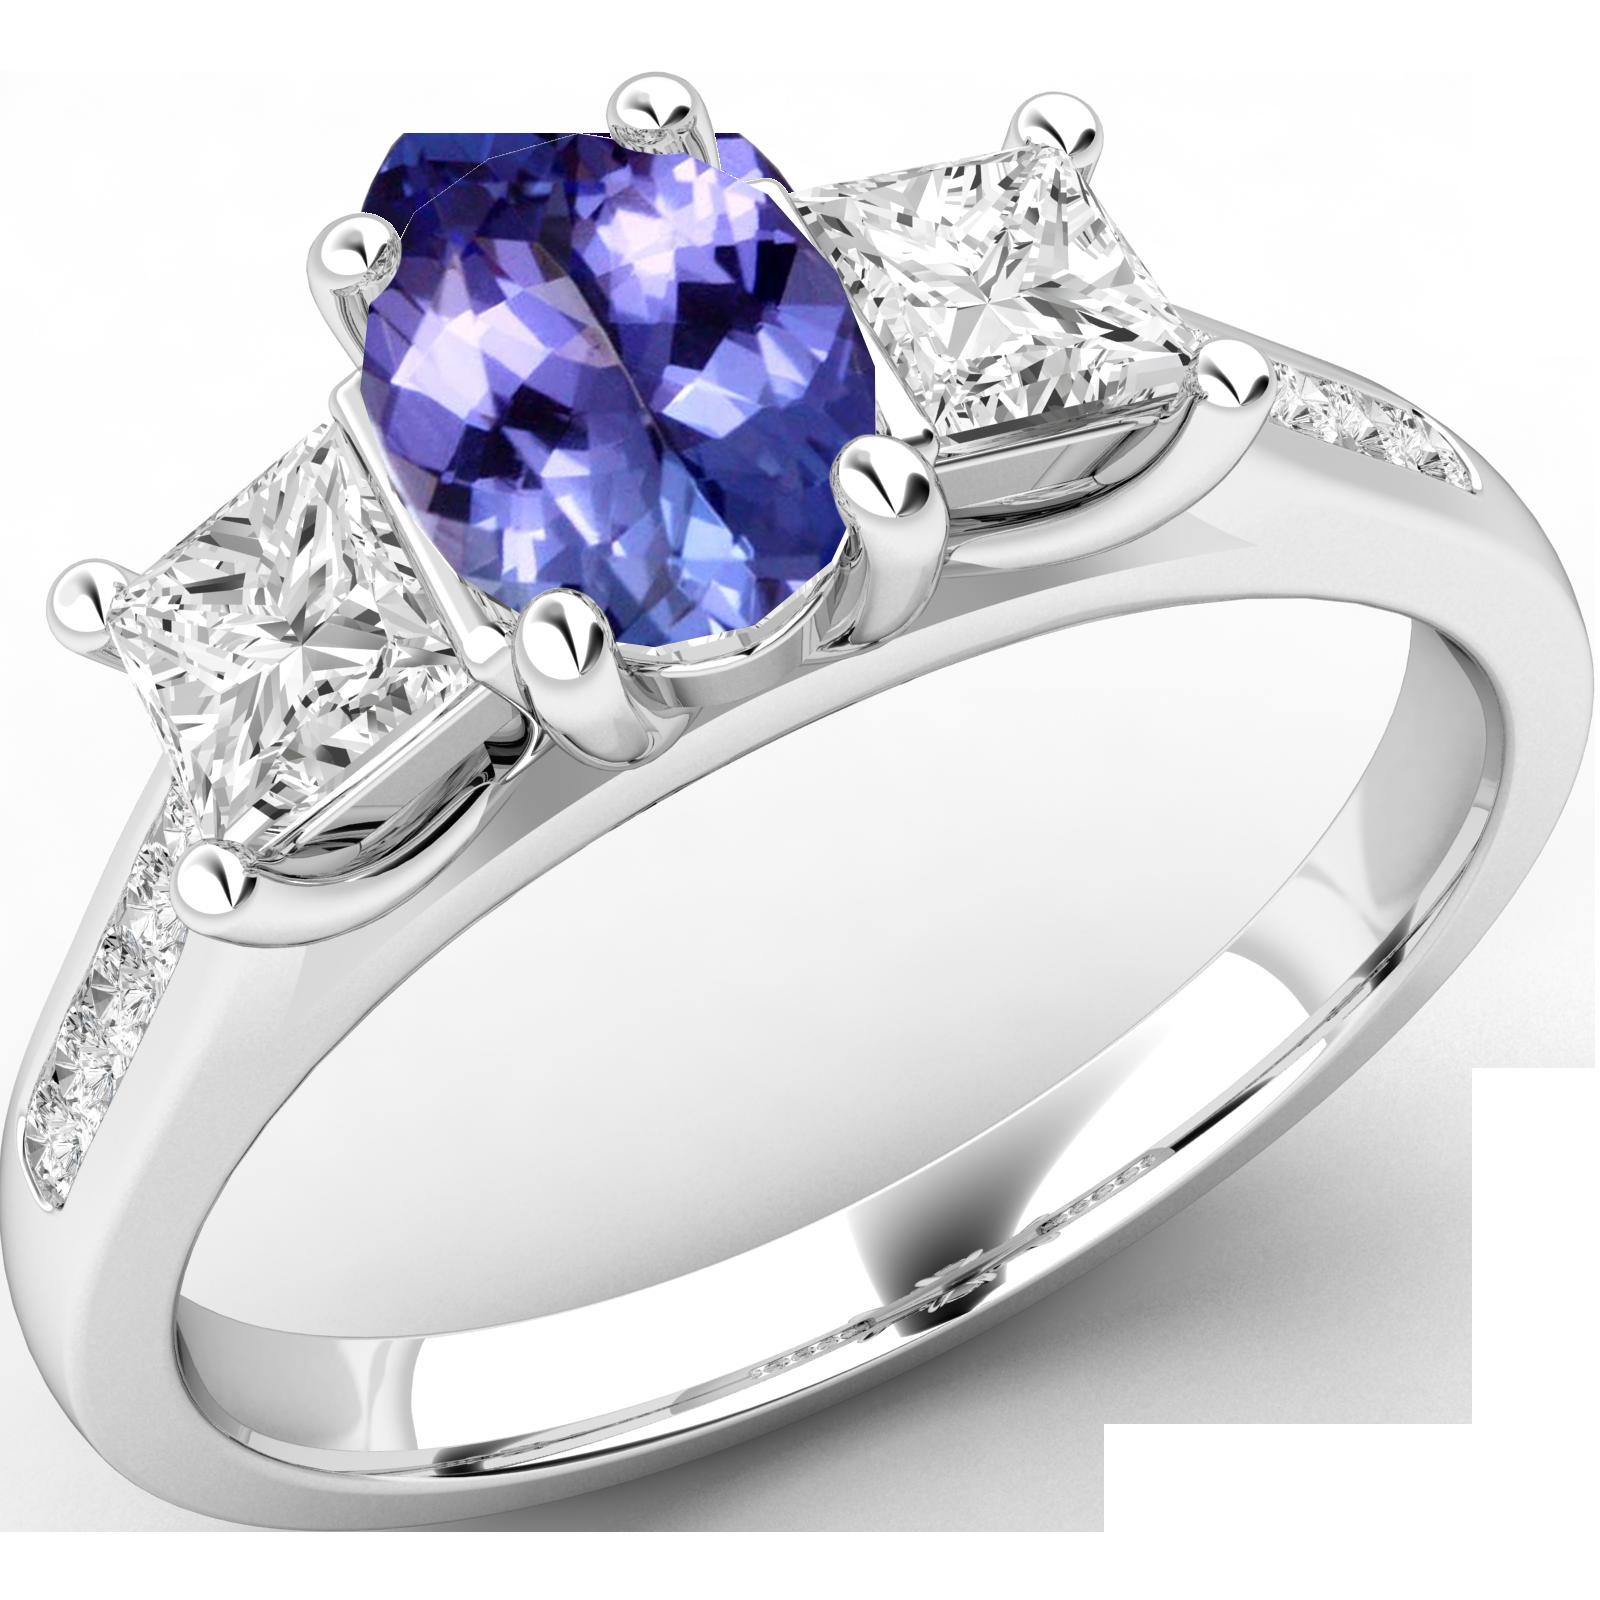 RDT568W-Inel cu Tanzanit si Diamant Dama Aur Alb 18kt cu un Tanzanit Oval si 2 Diamante Princess in Setare Gheare,Stil Elegant-img1